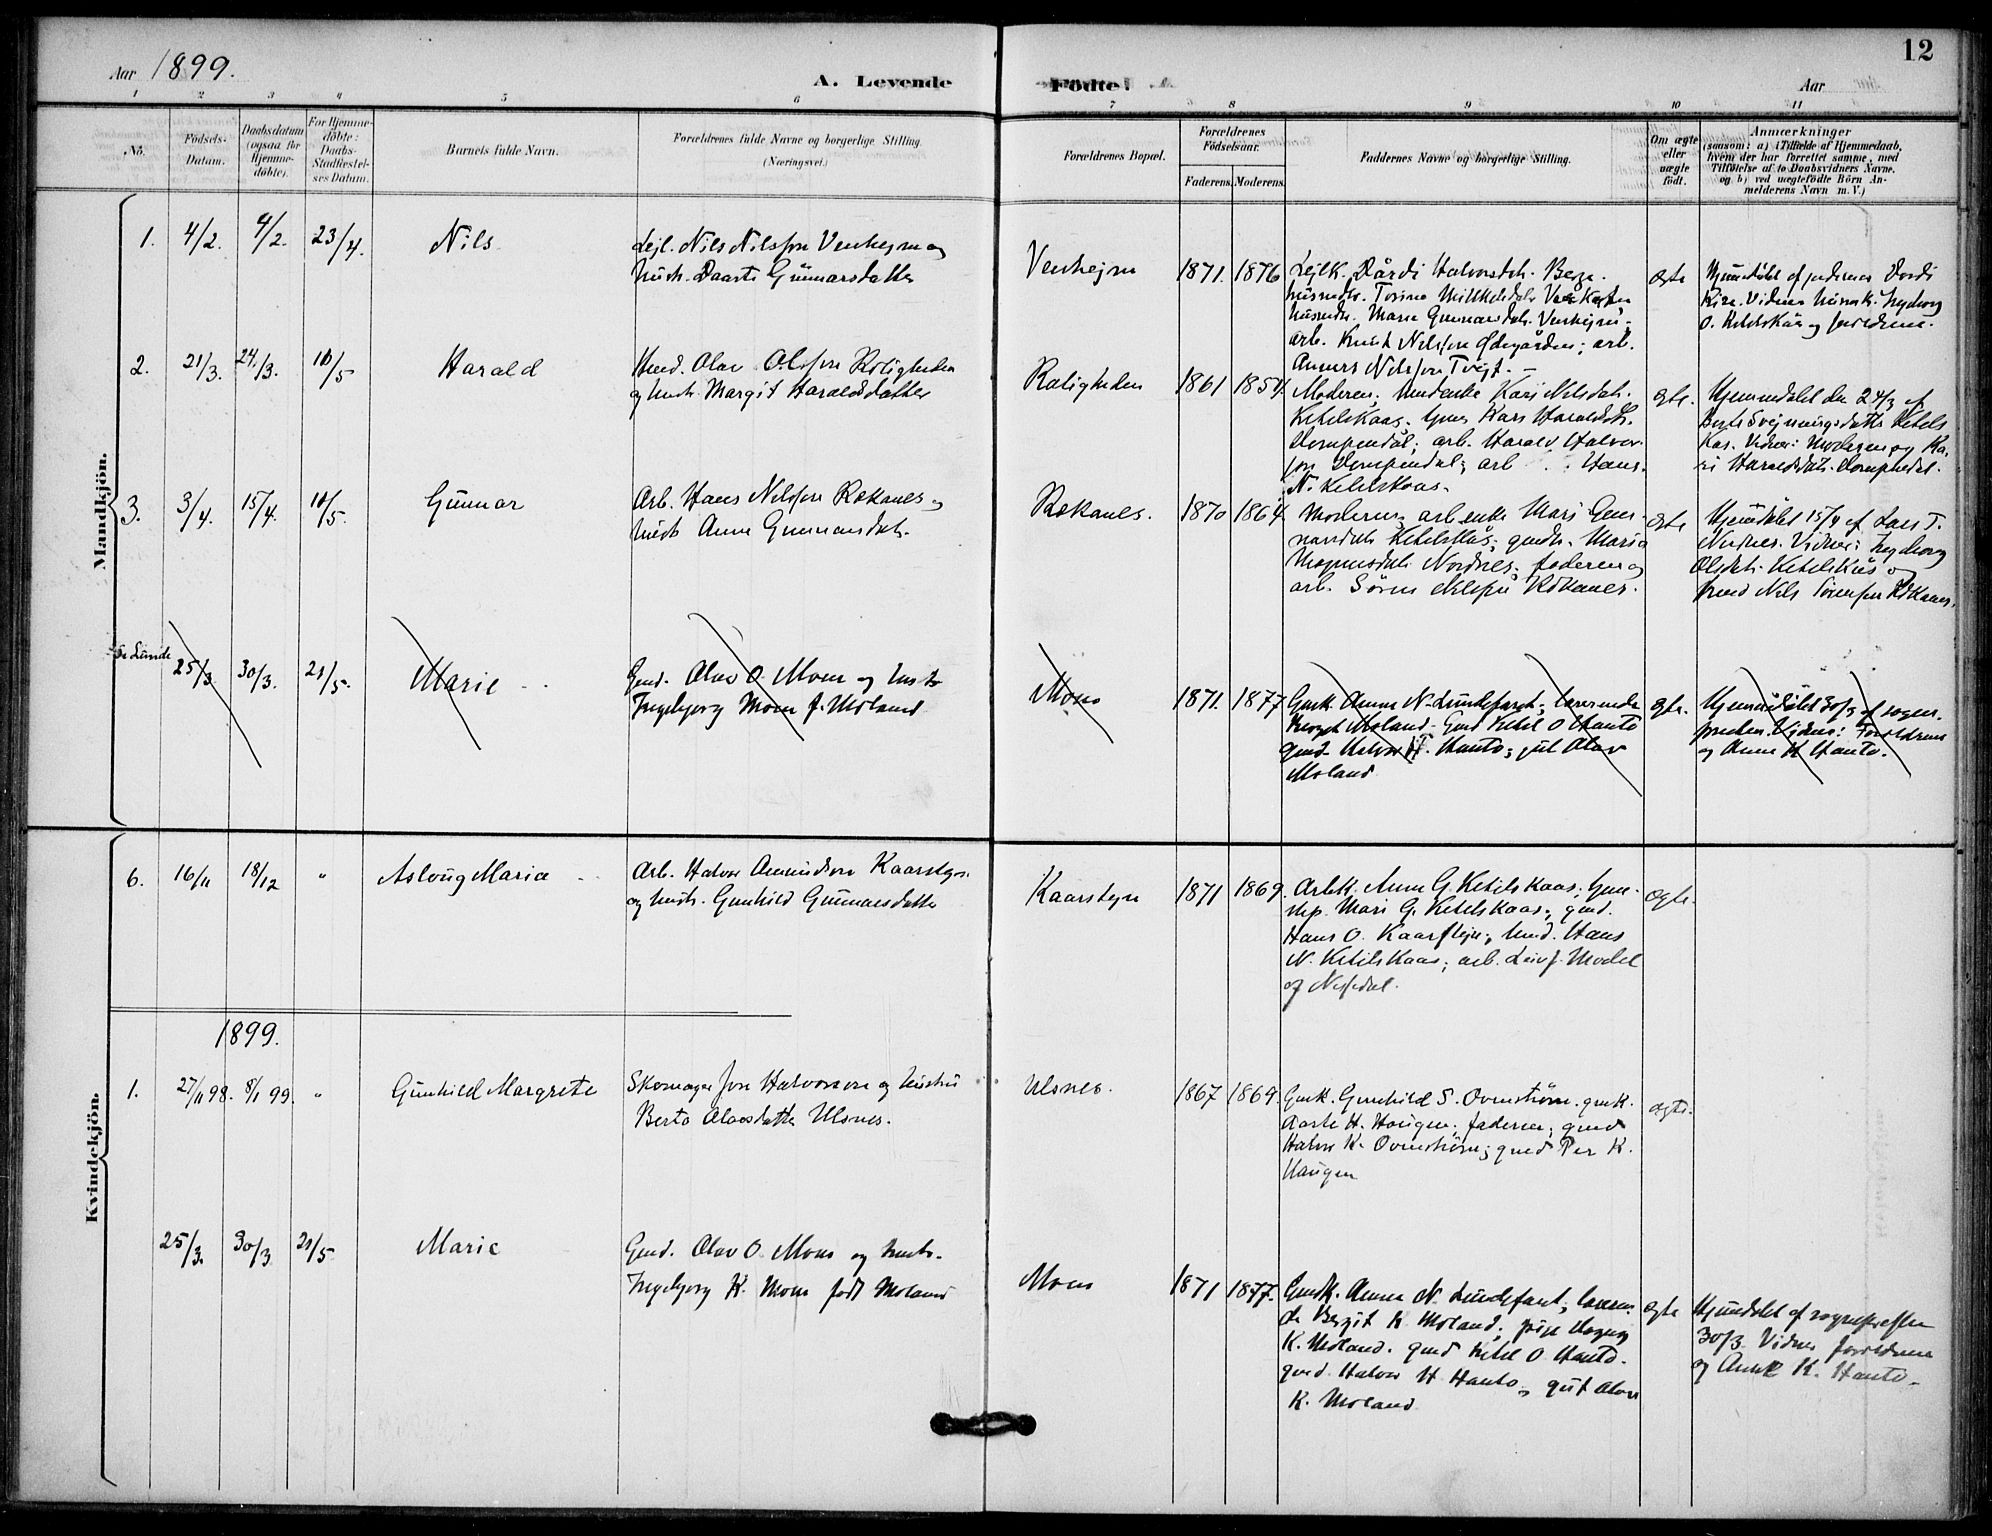 SAKO, Lunde kirkebøker, F/Fb/L0004: Ministerialbok nr. II 4, 1892-1907, s. 12